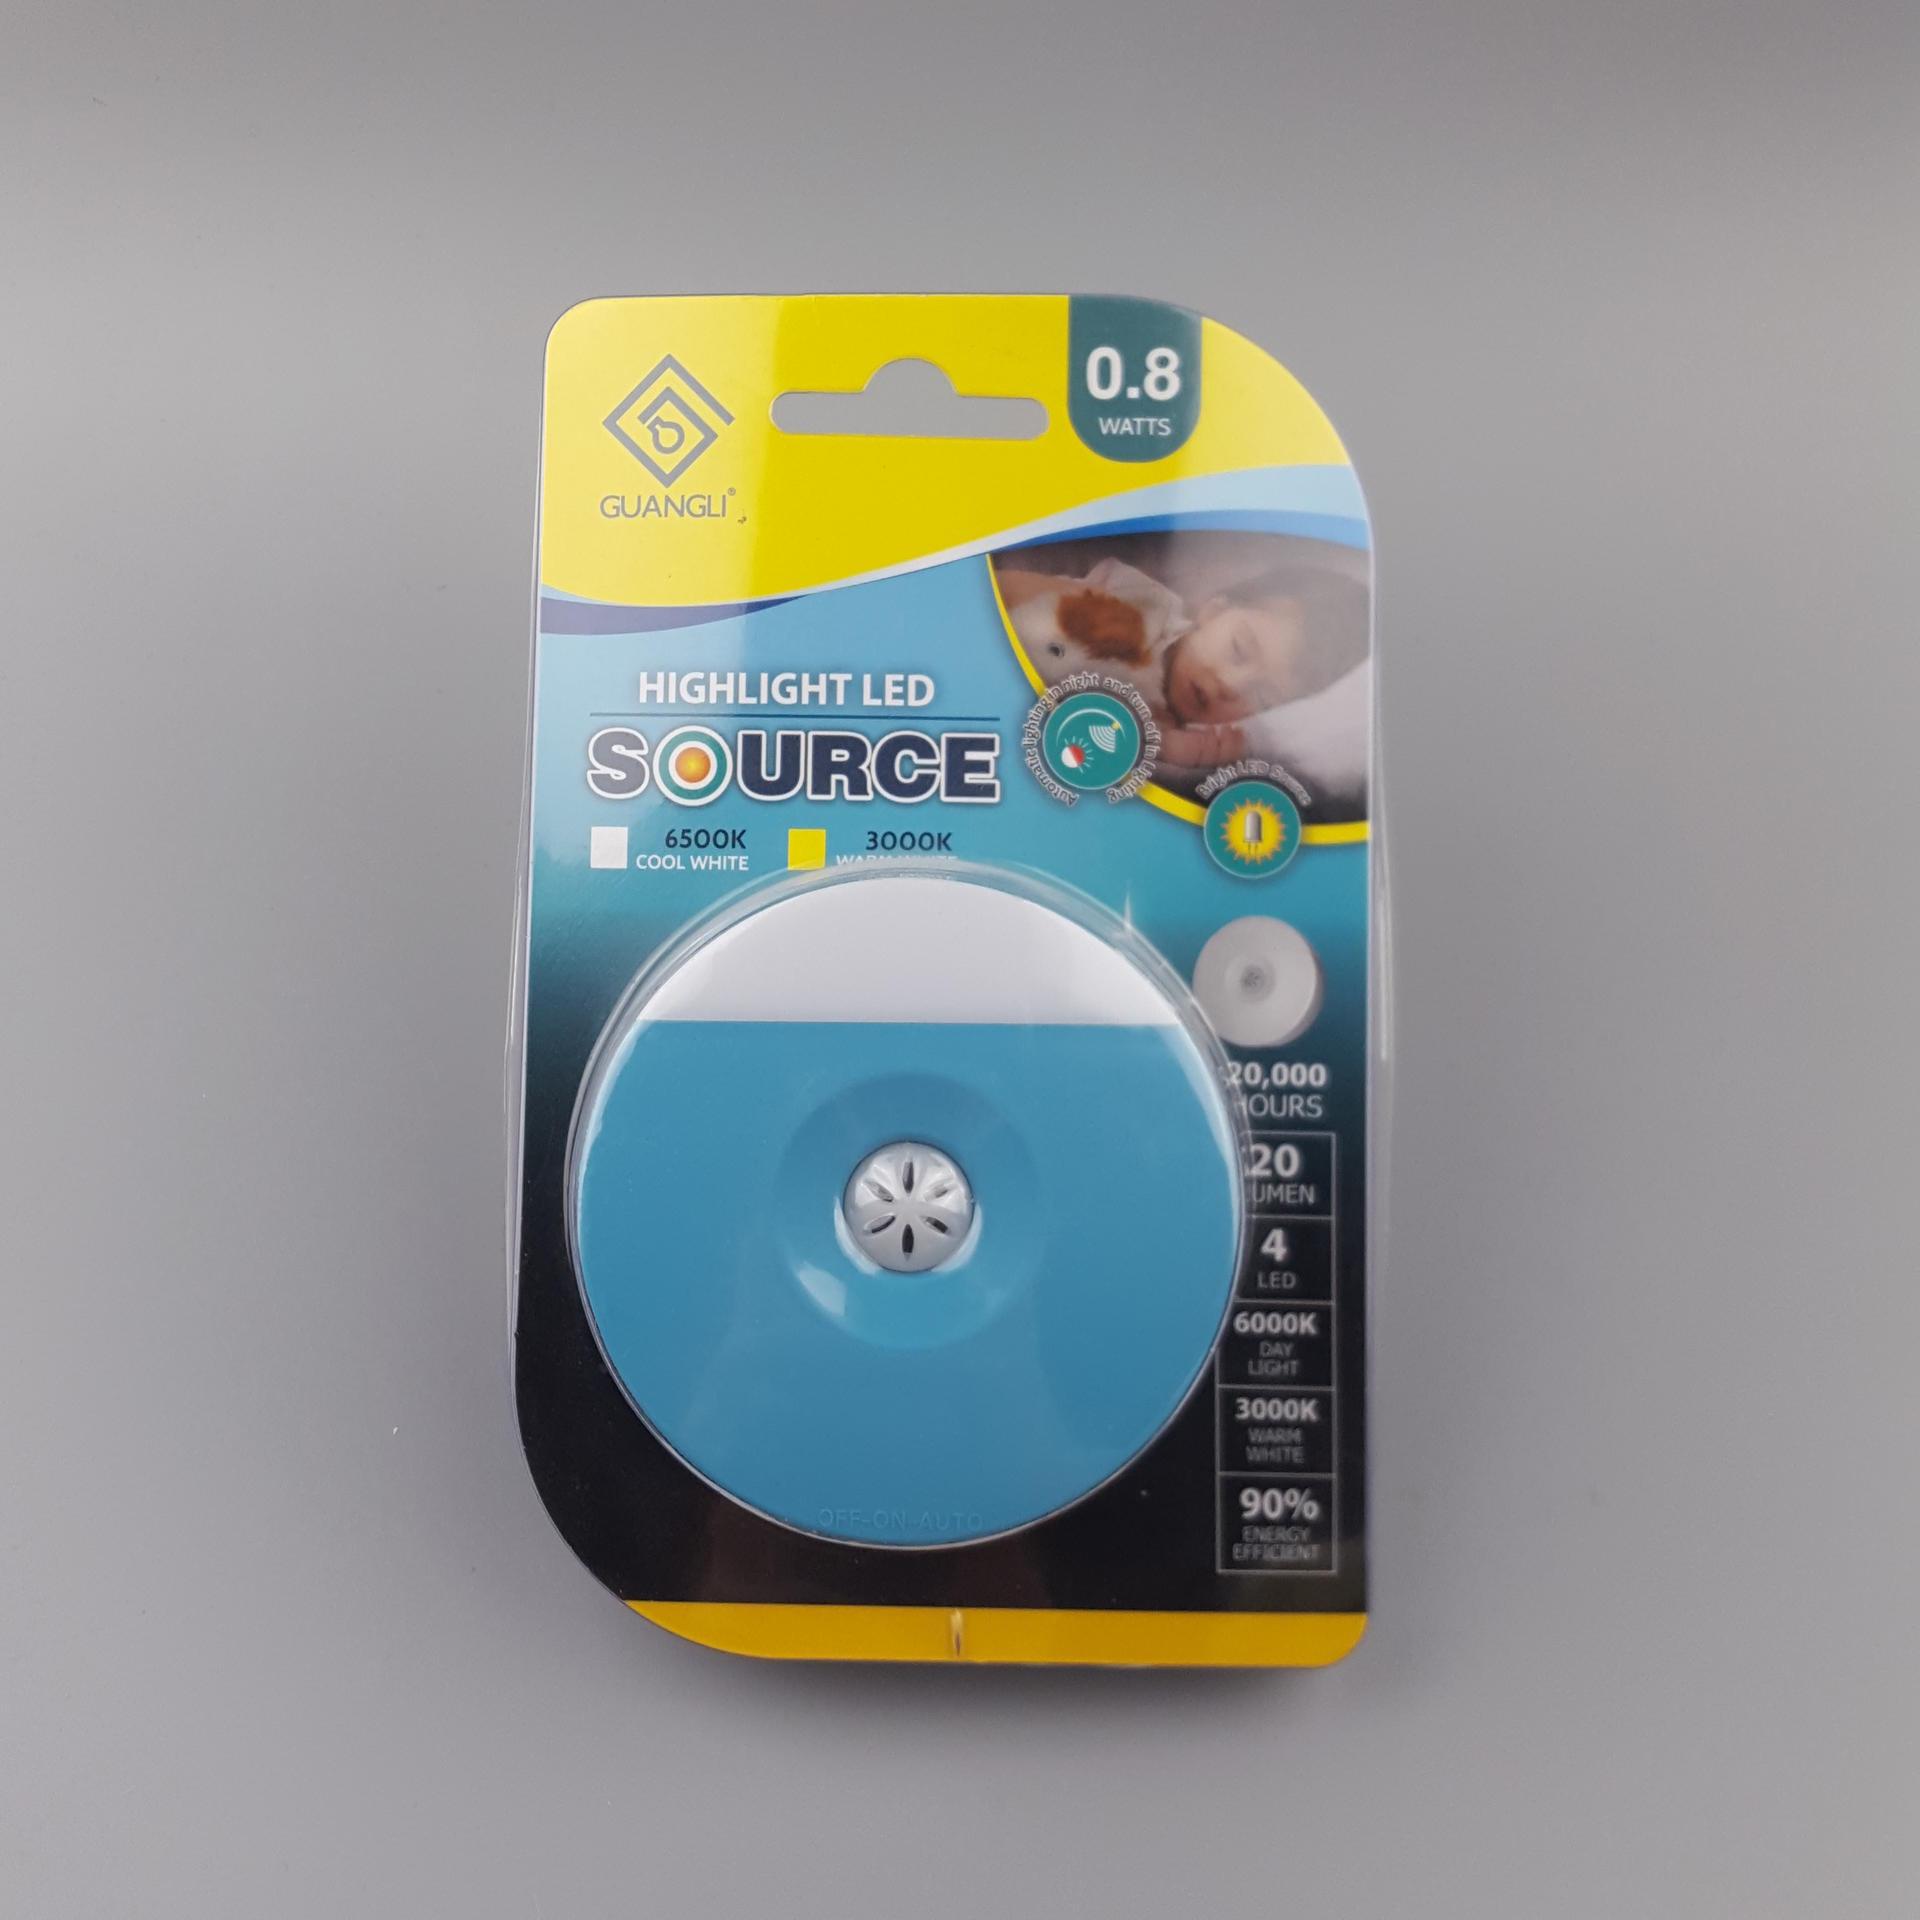 plug in Night Light Auto Sensor Control Lamp Bedroom hallway Light A82 CE ROSH BS Wall LED